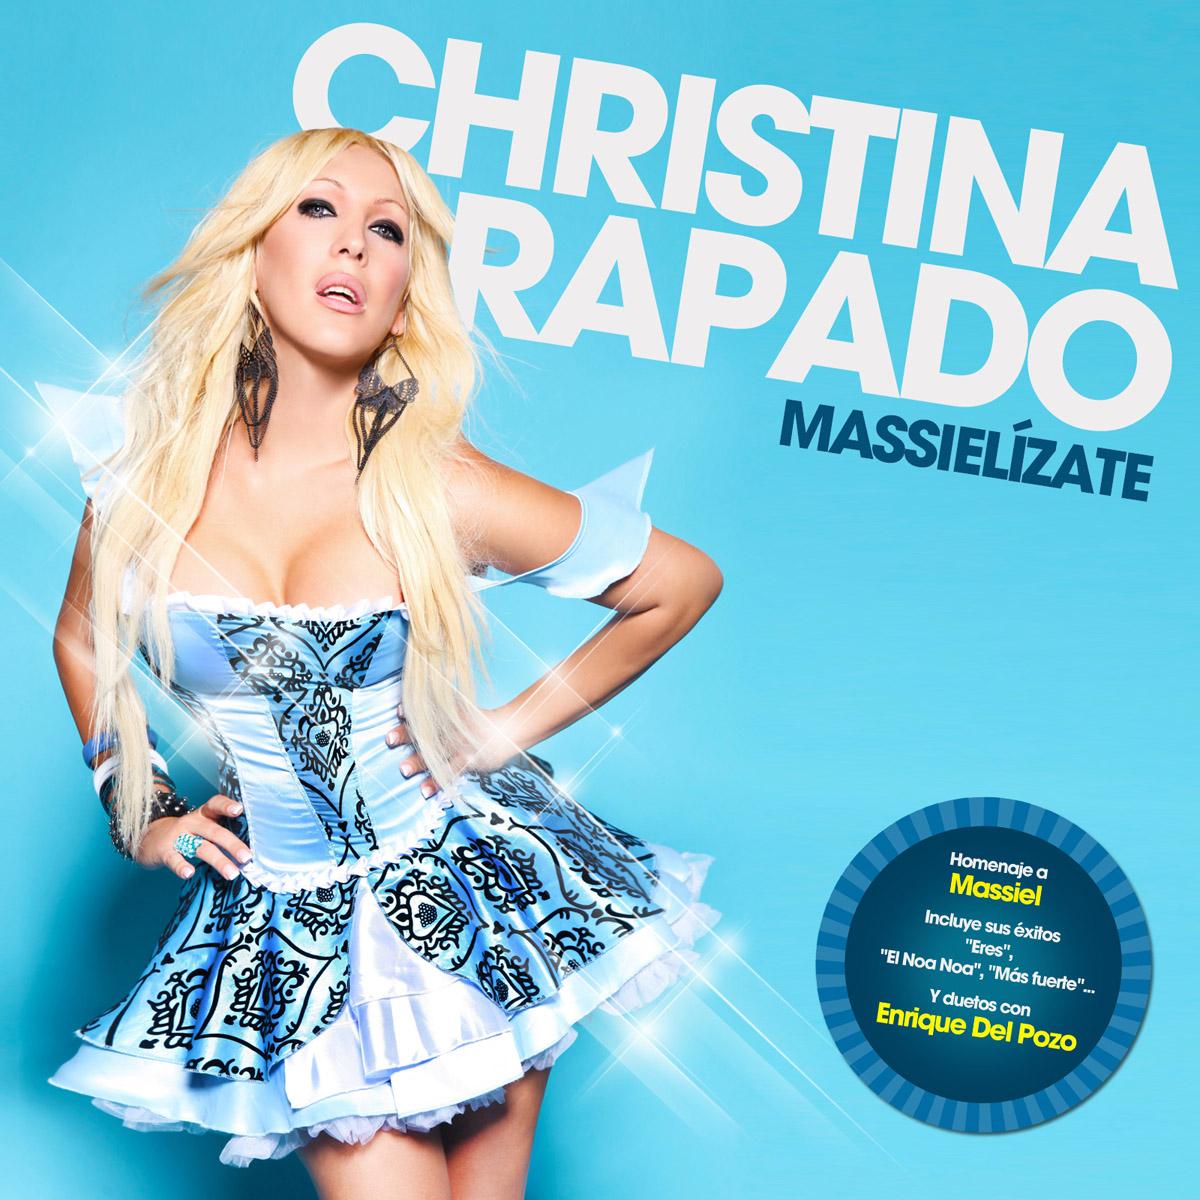 Cristina rapado desnuda interview pic 37